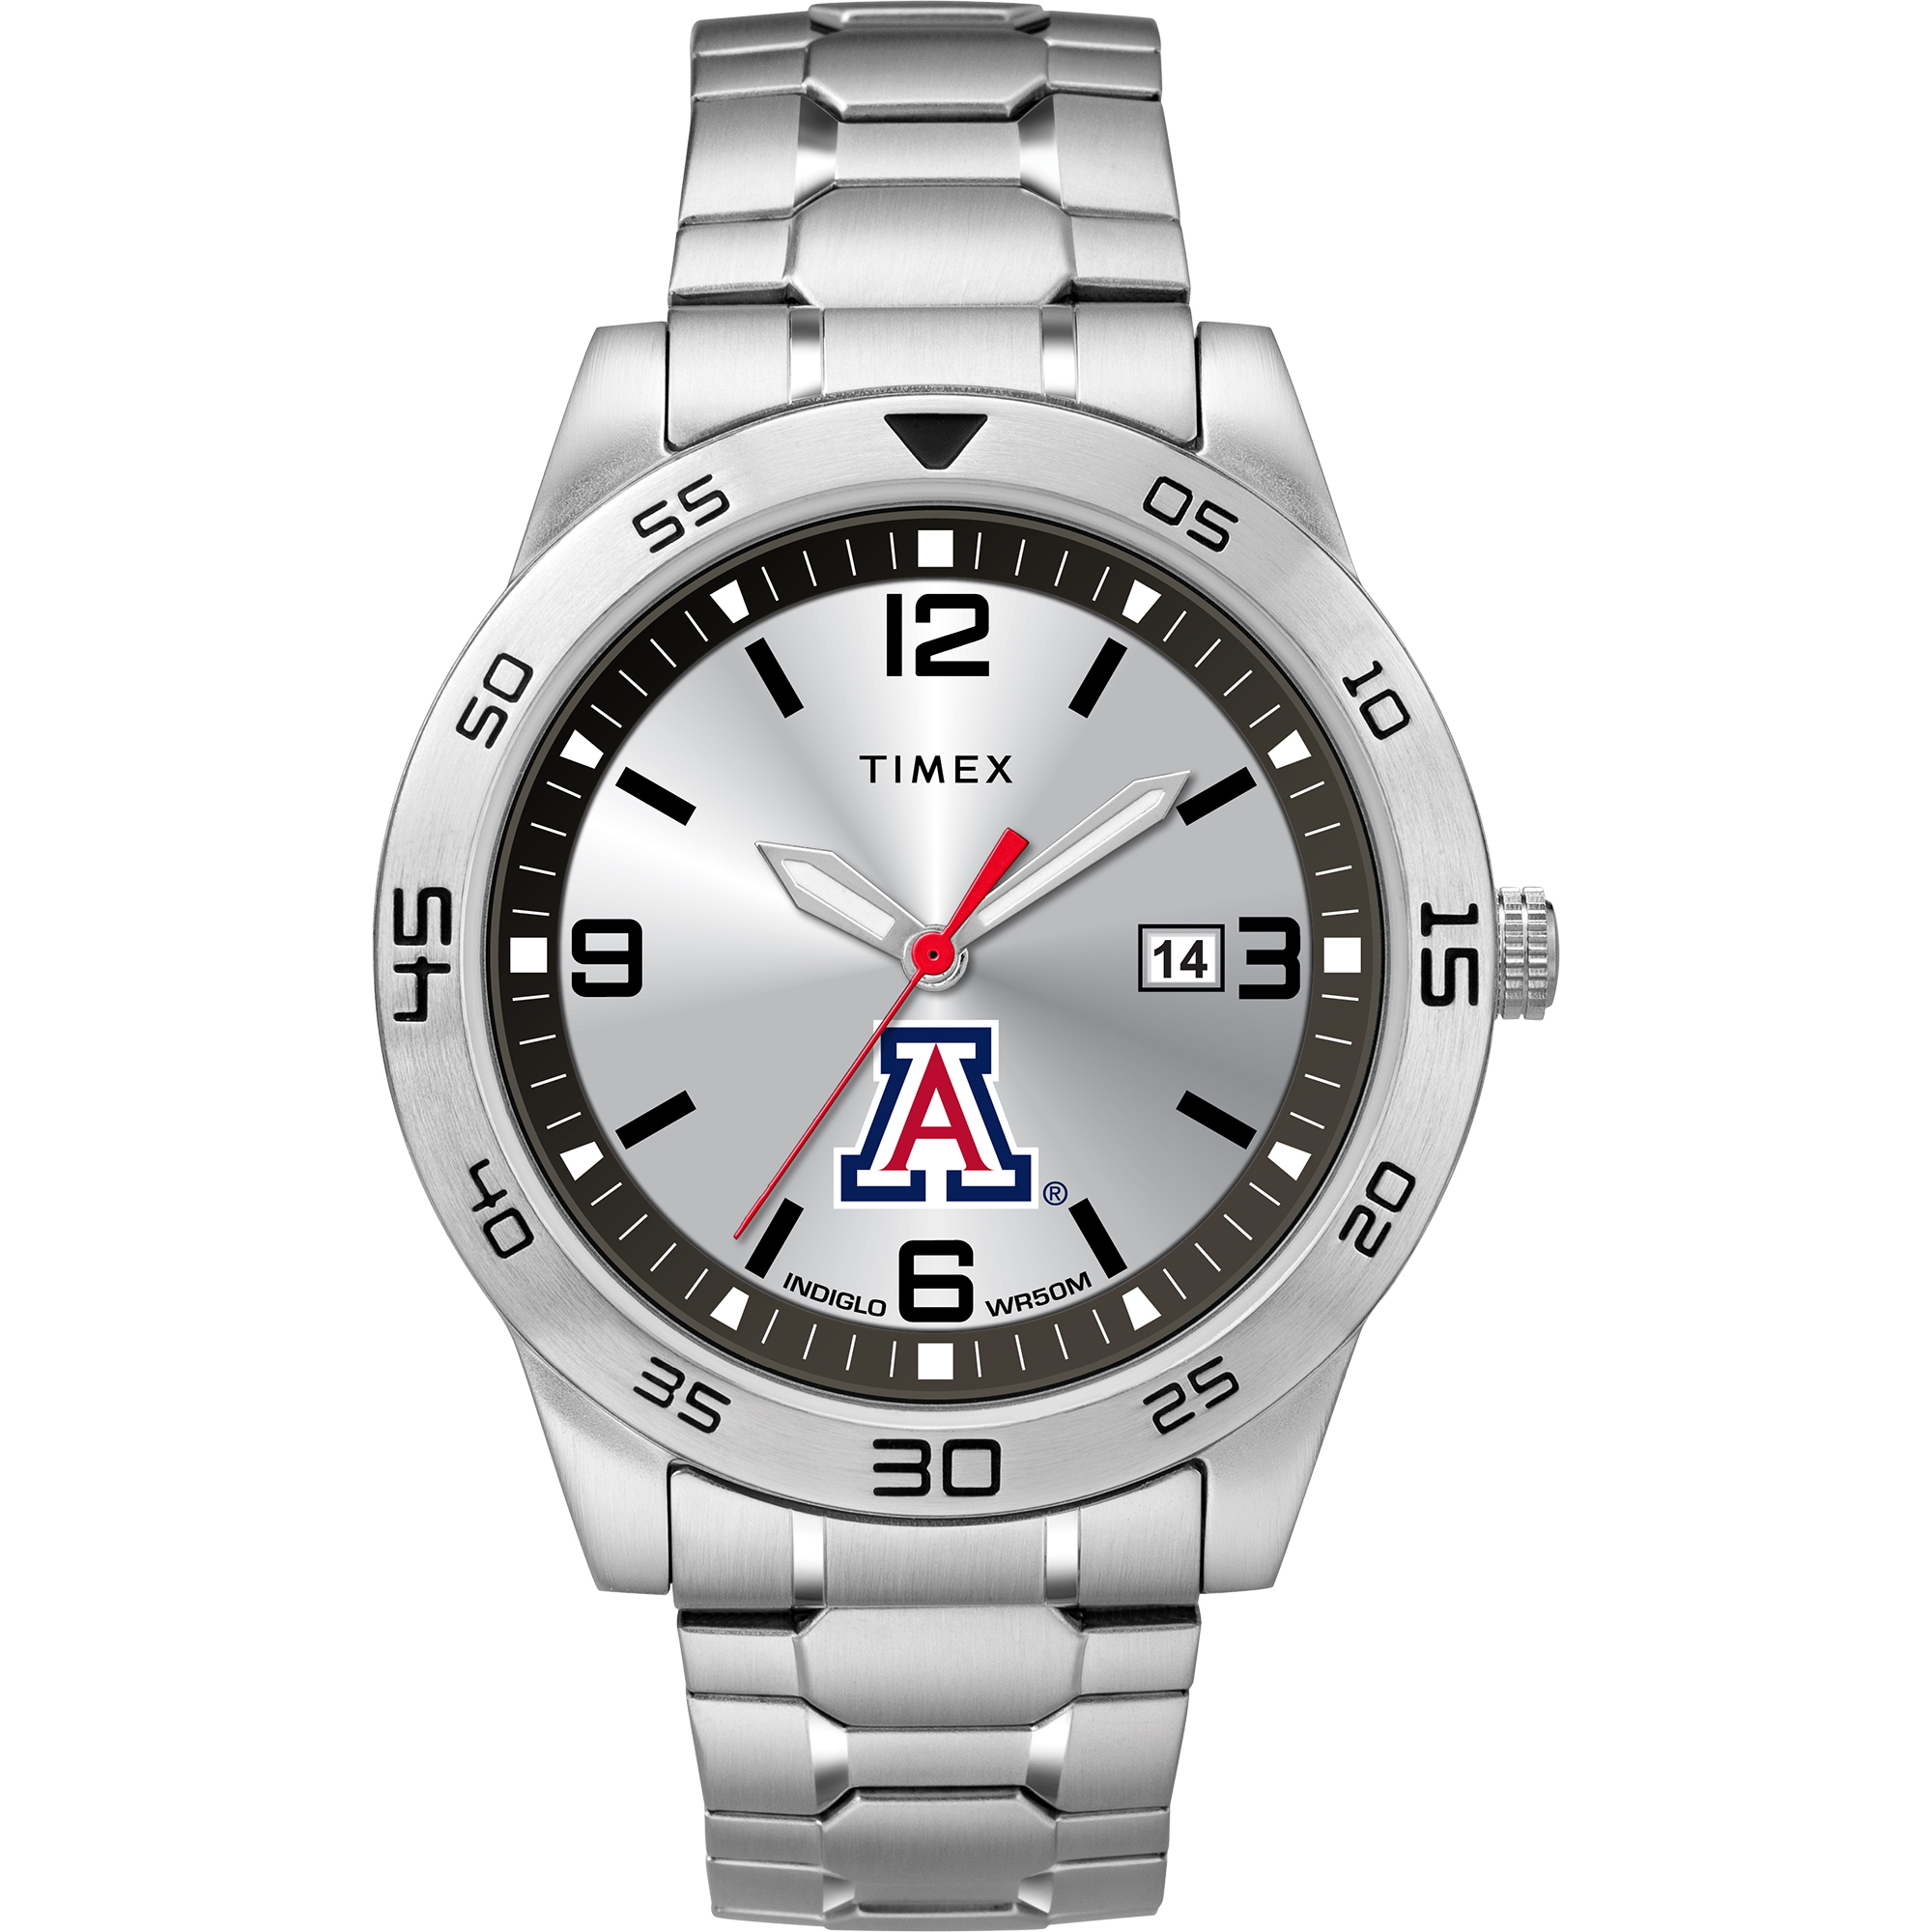 Timex - NCAA Tribute Collection Citation Men's Watch, University of Arizona Wildcats